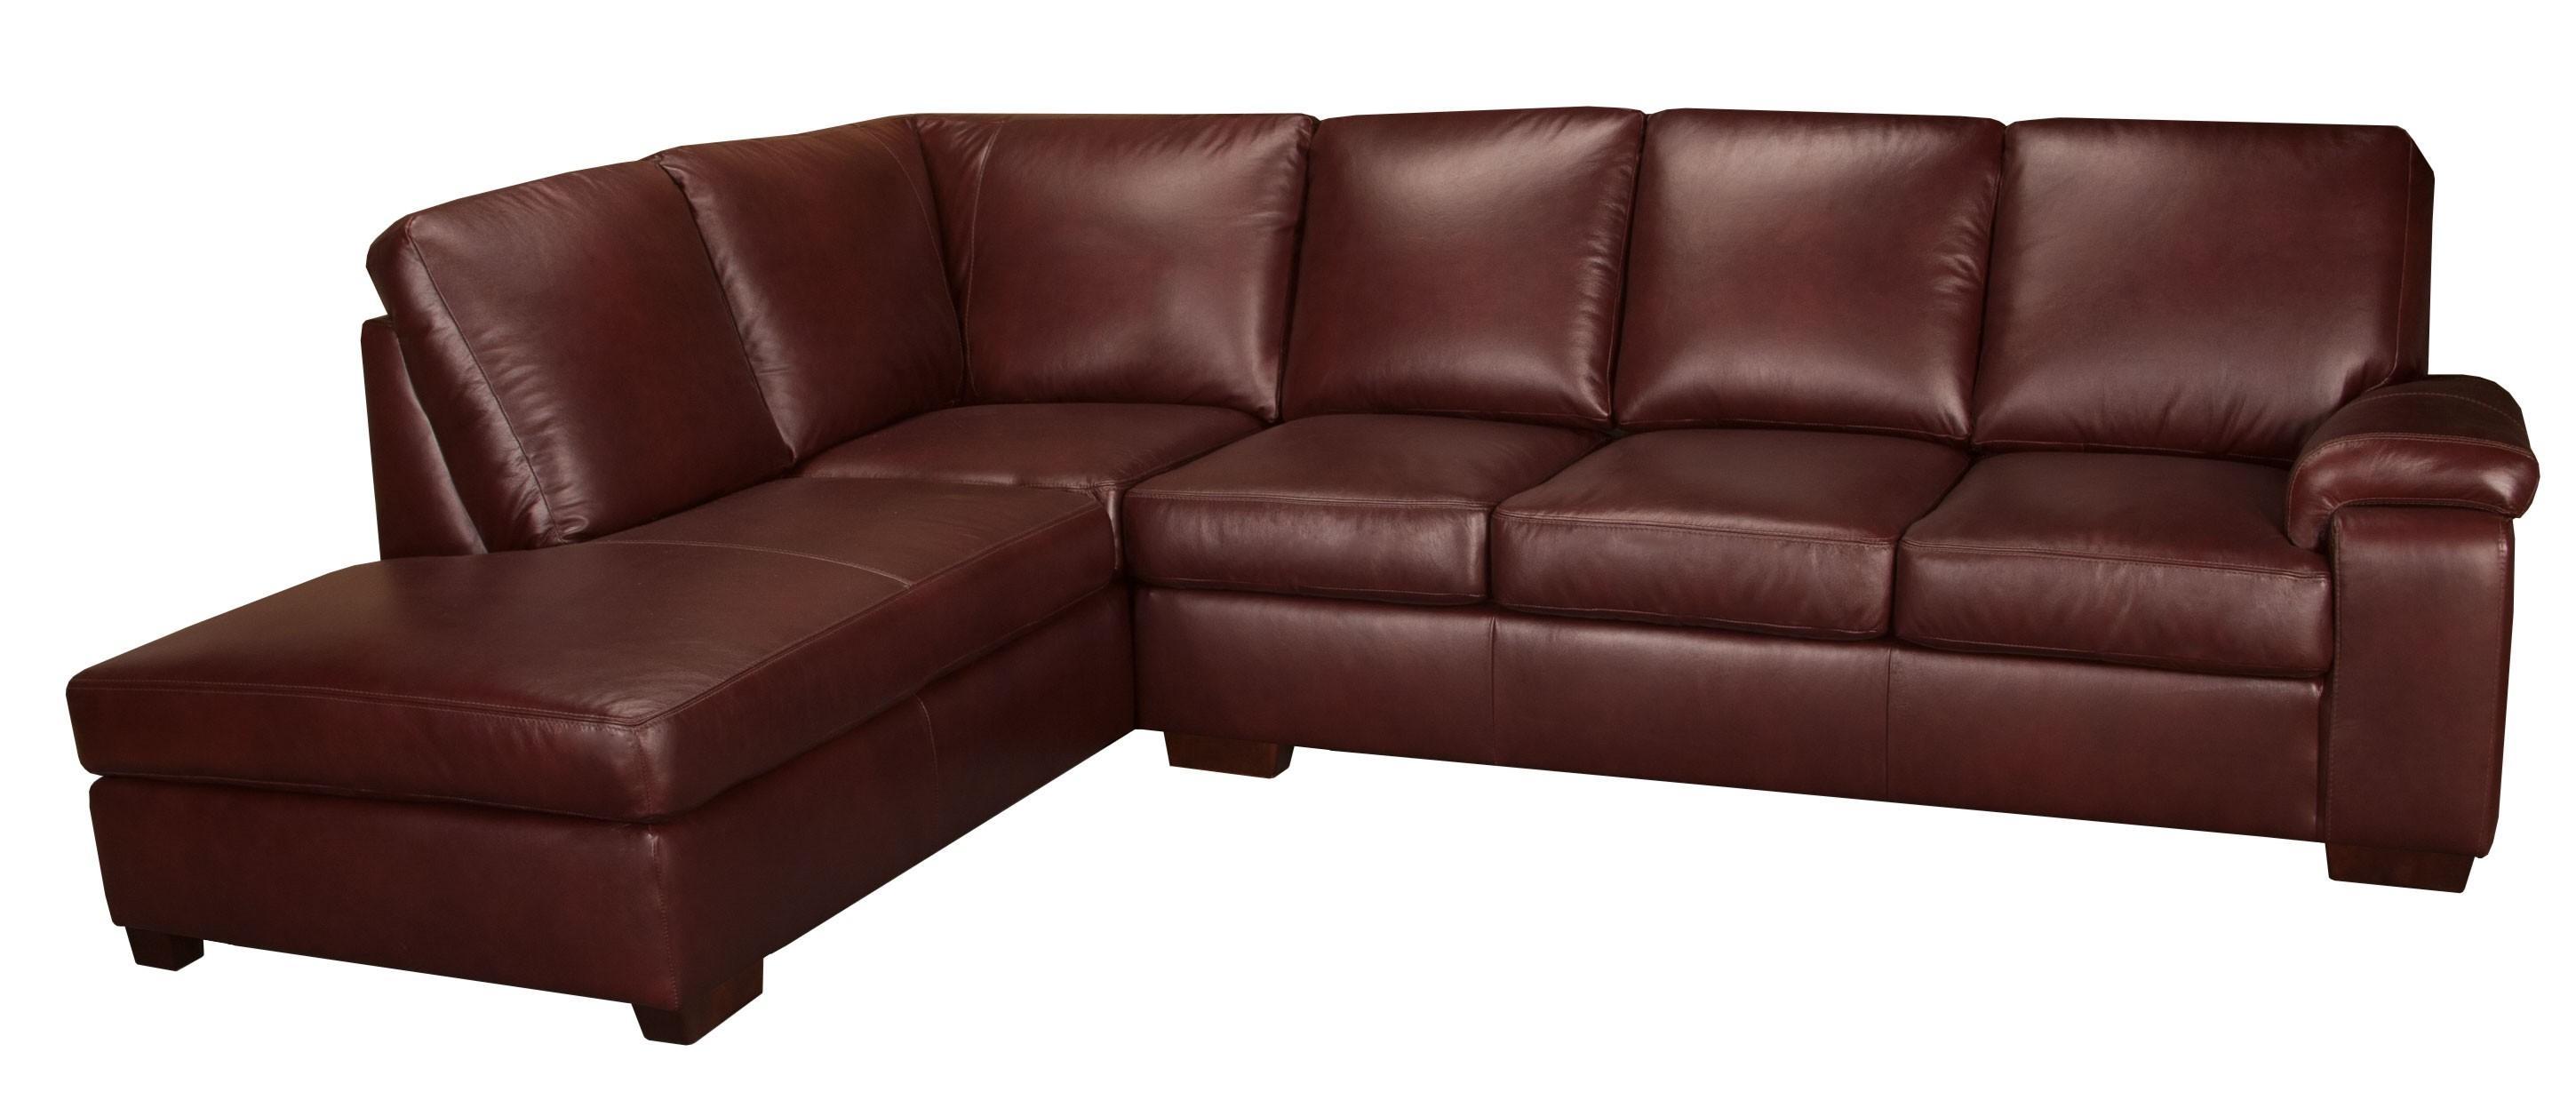 Sectional Sofa Sale Gta